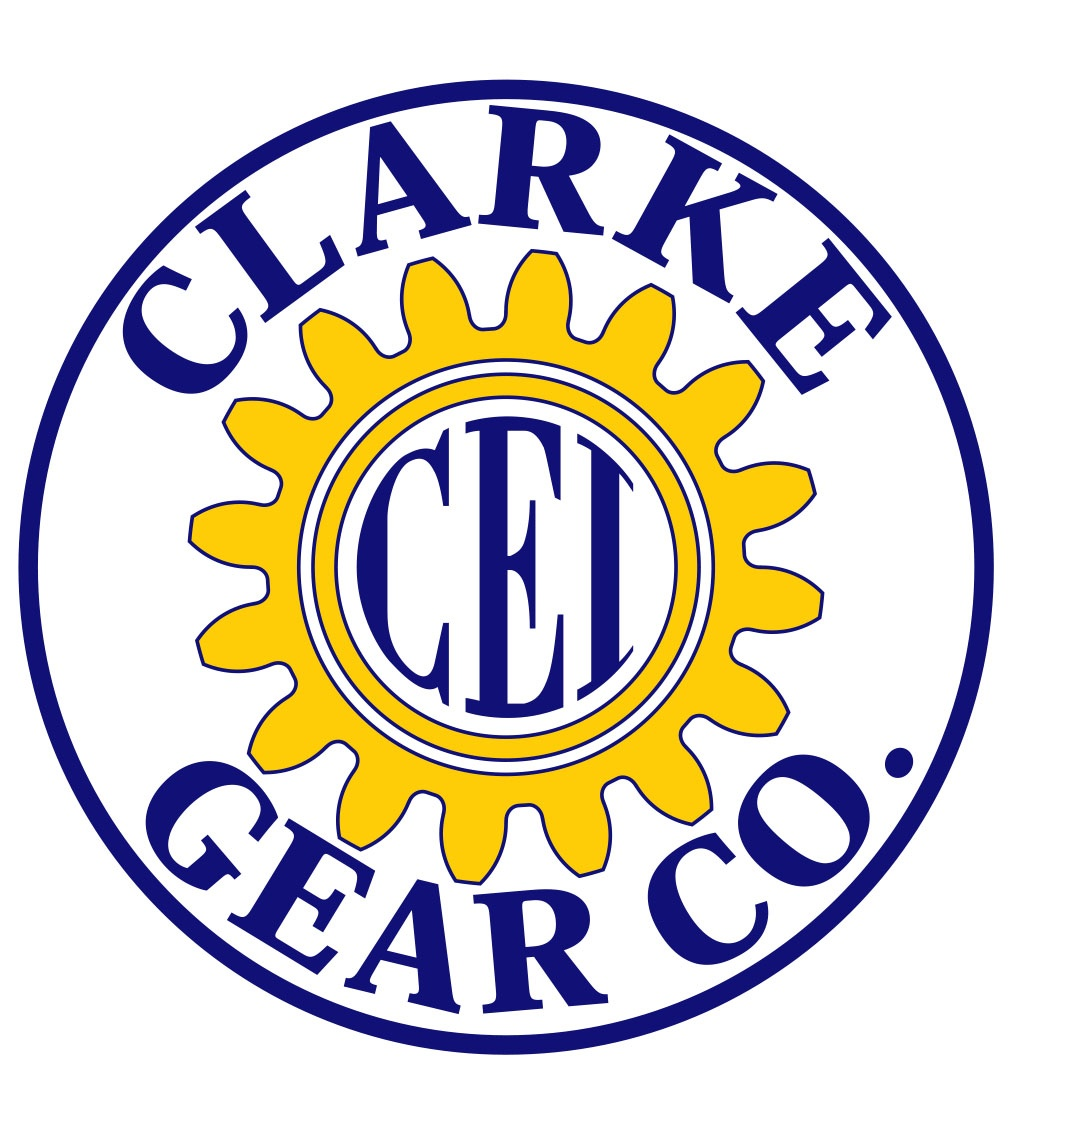 Made-in-California-manufacturer-Clarke-Engineering-Logo.jpg